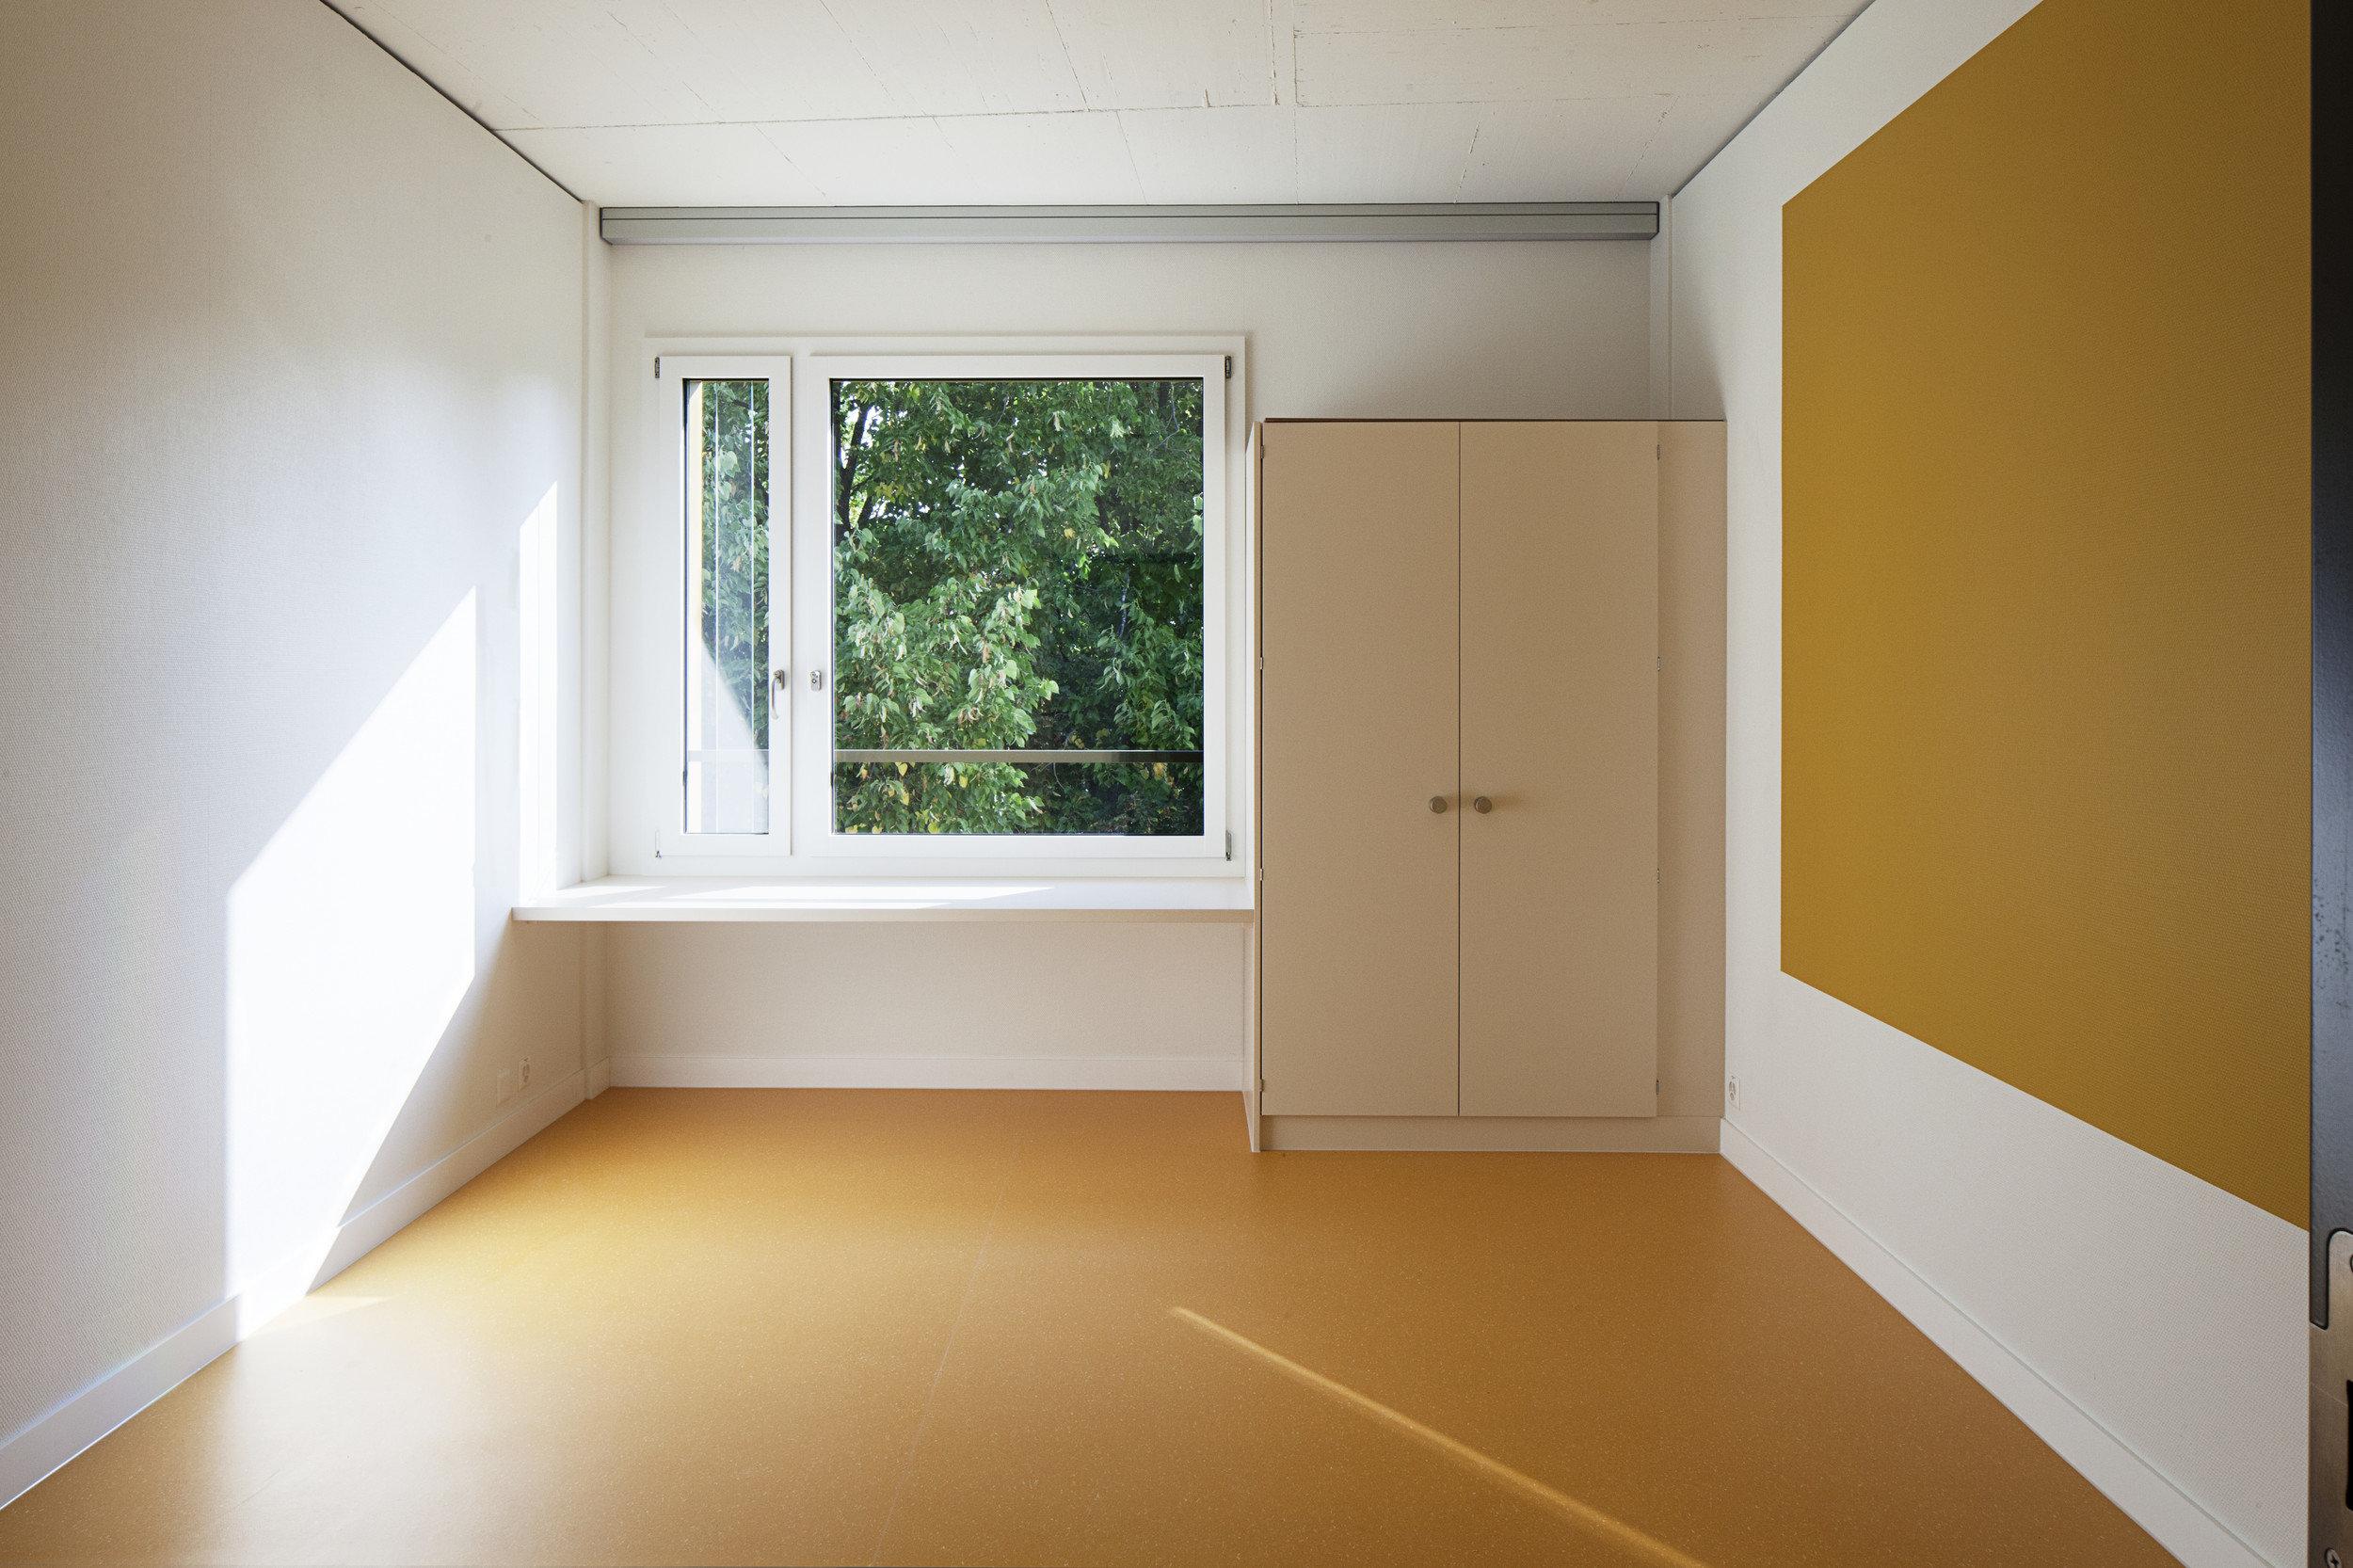 Zimmer mit Doppelflügelfensterelement in bunter Atmosphäre